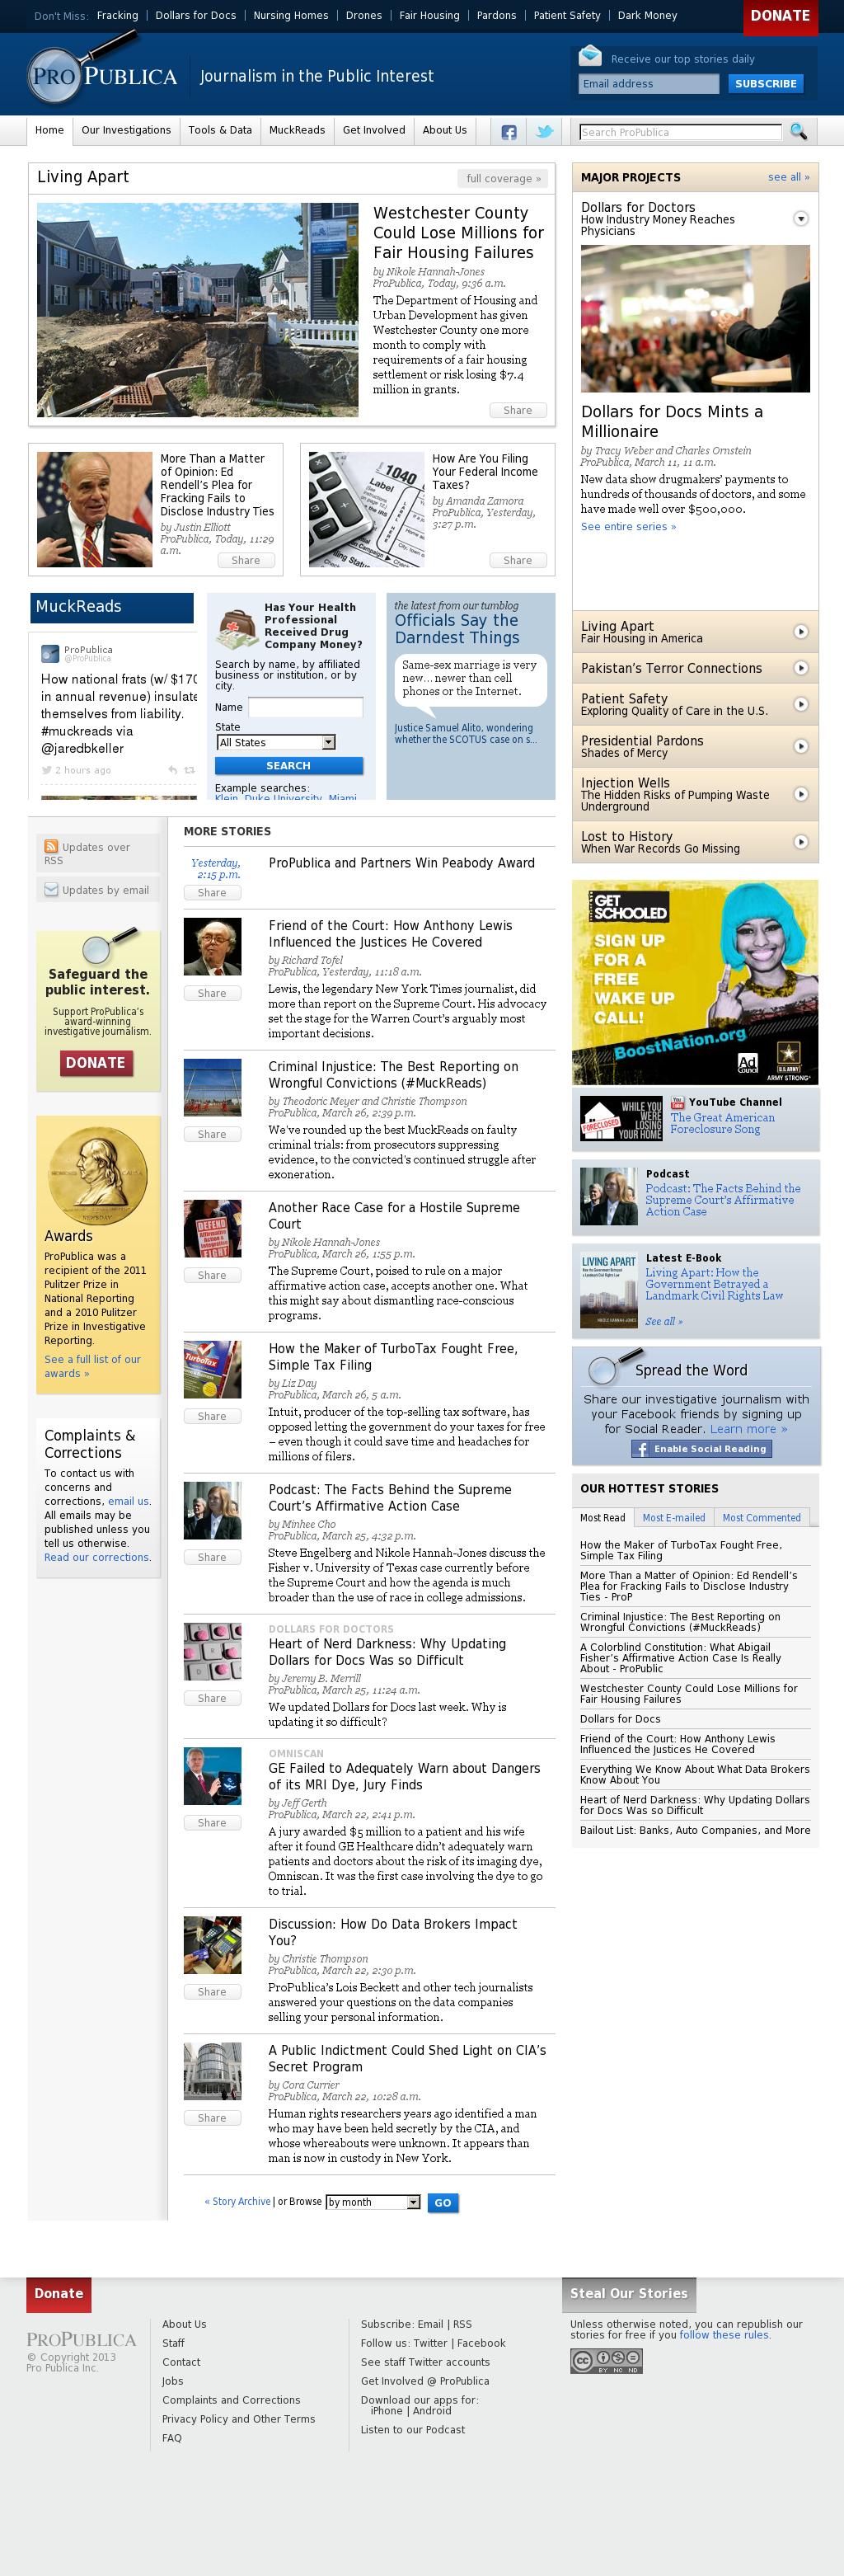 ProPublica at Thursday March 28, 2013, 5:17 p.m. UTC